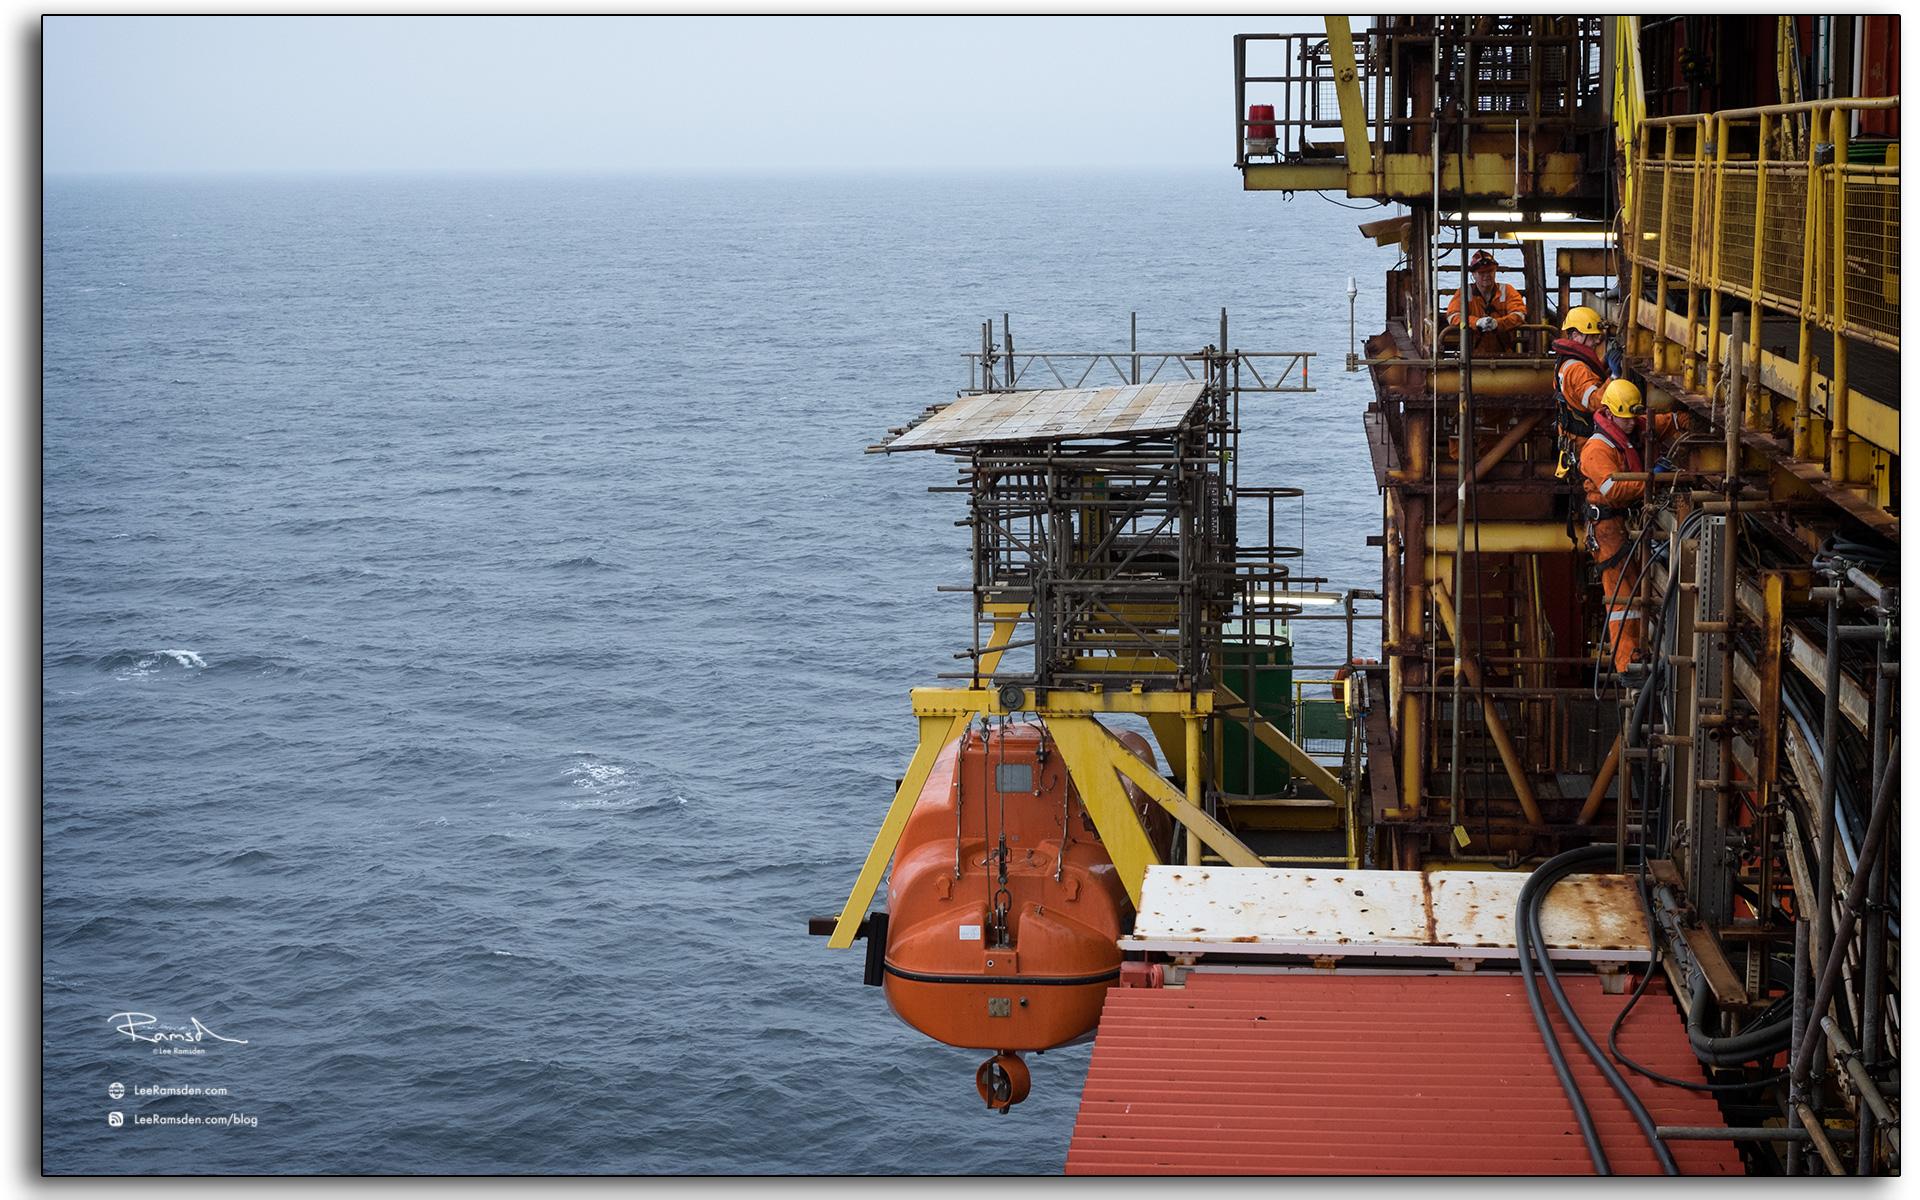 Gordon Hossack Steven Mcleannon Inverness Auk oil rig Talisman